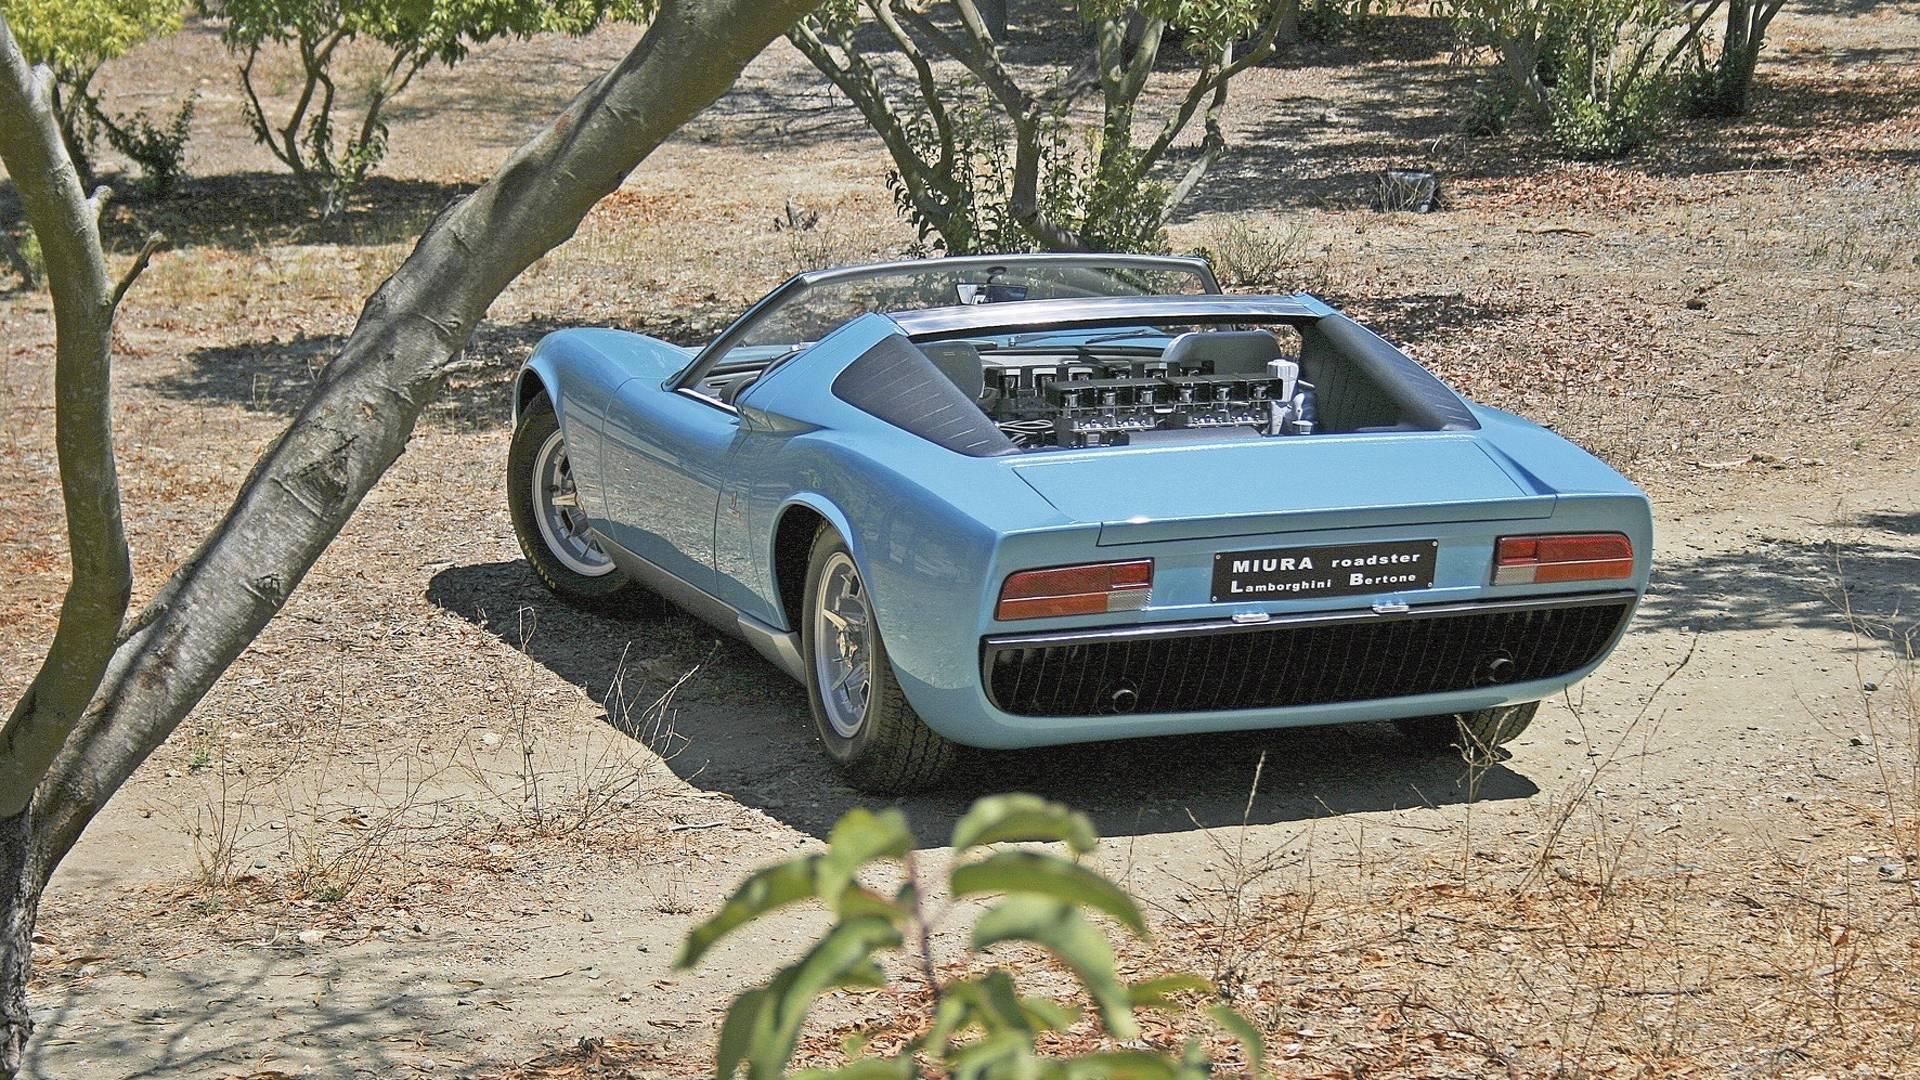 5a4ca5c88a397 lamborghini miura roadster لامبورگینی میورا روداستر نقد و بررسی   اجاره ماشین